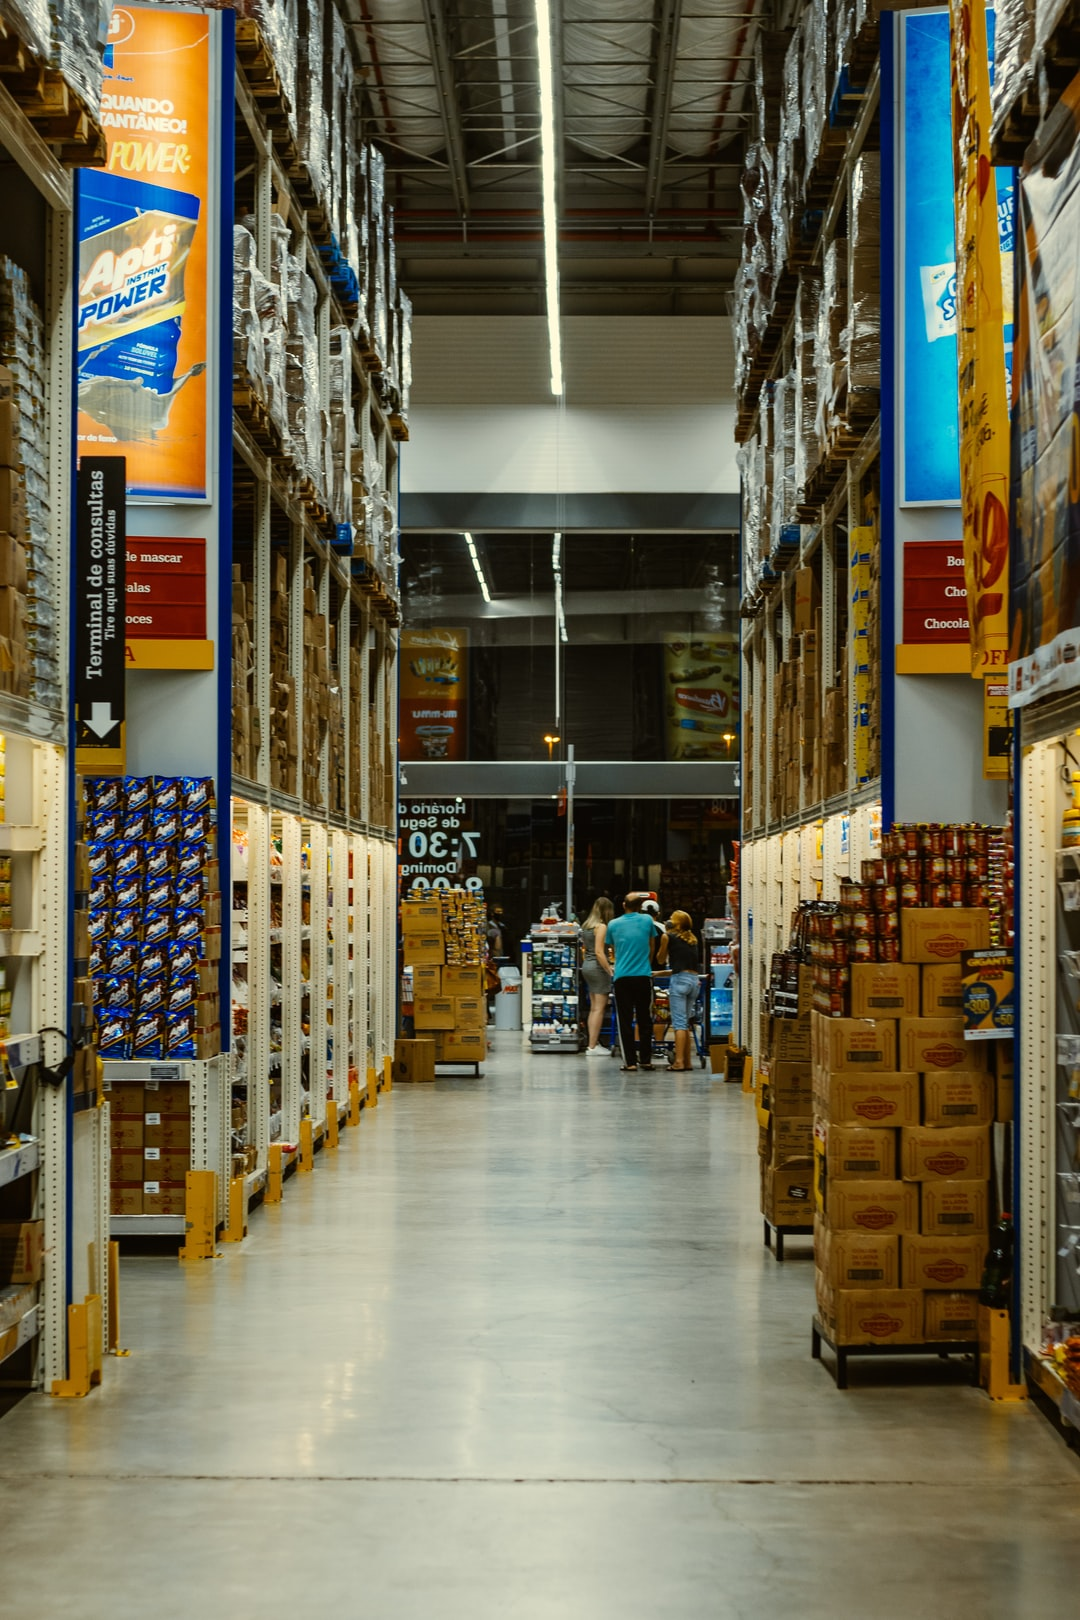 Warehousing and Distribution at Expedite